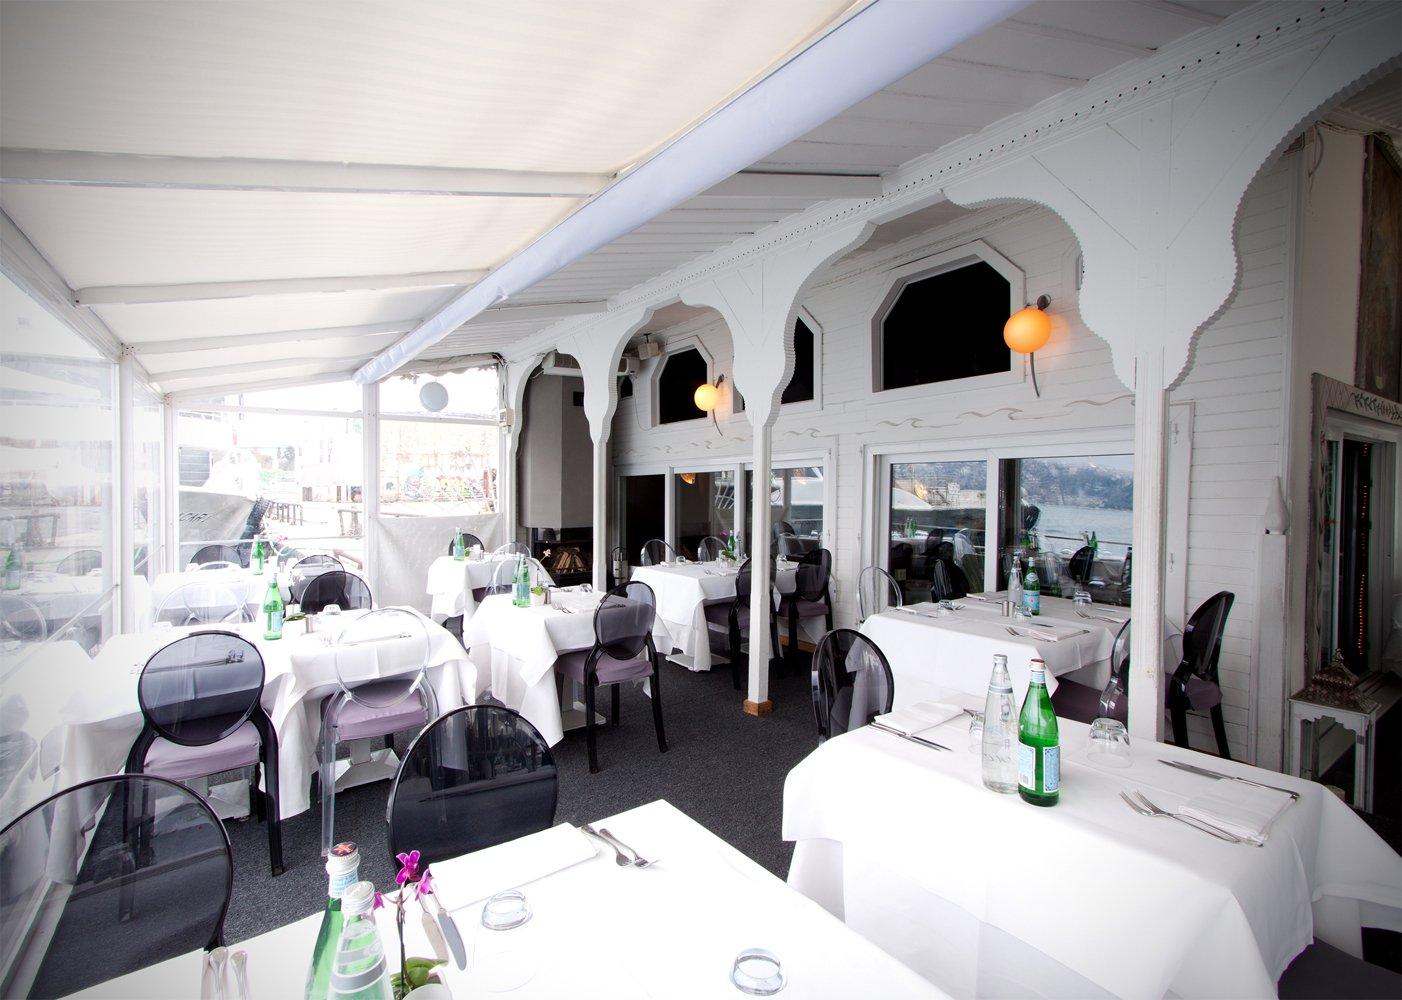 gurmerehberi - mia mensa romantik akşam yemeği